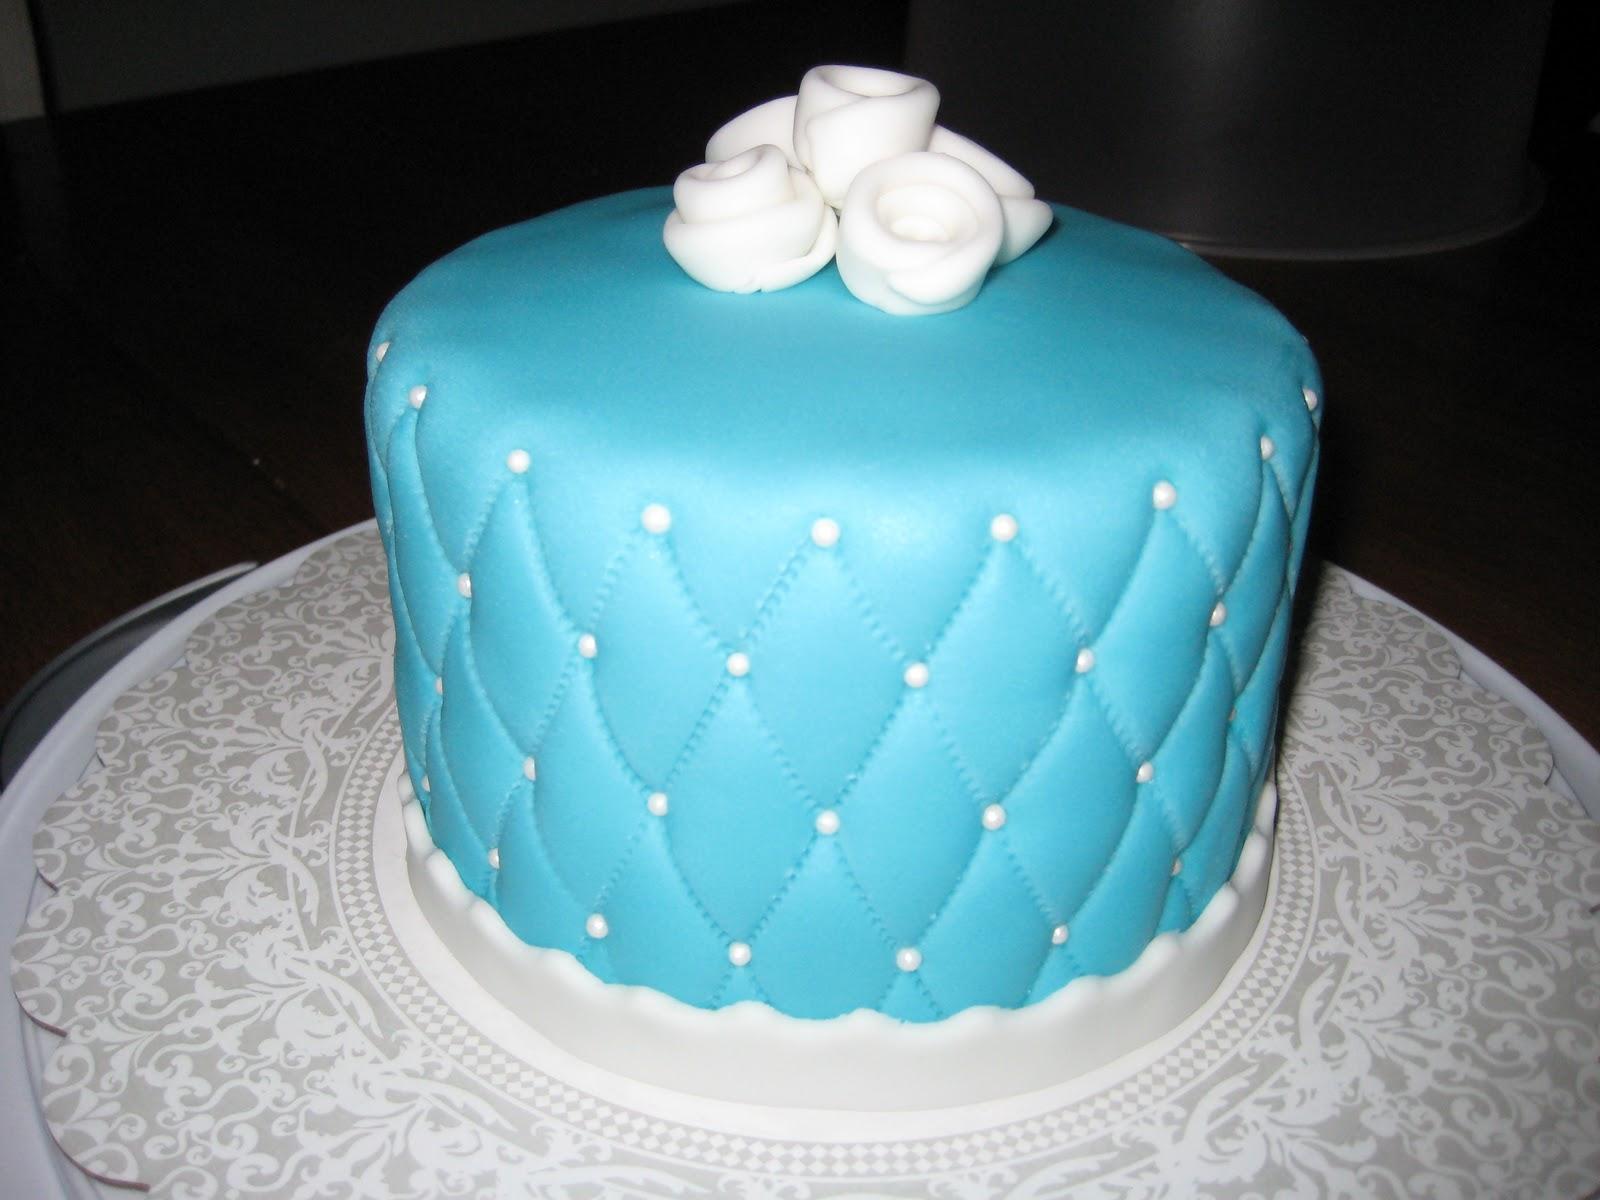 Blue Fondant Cake Design : Voluntier Cakes: Fondant Cakes